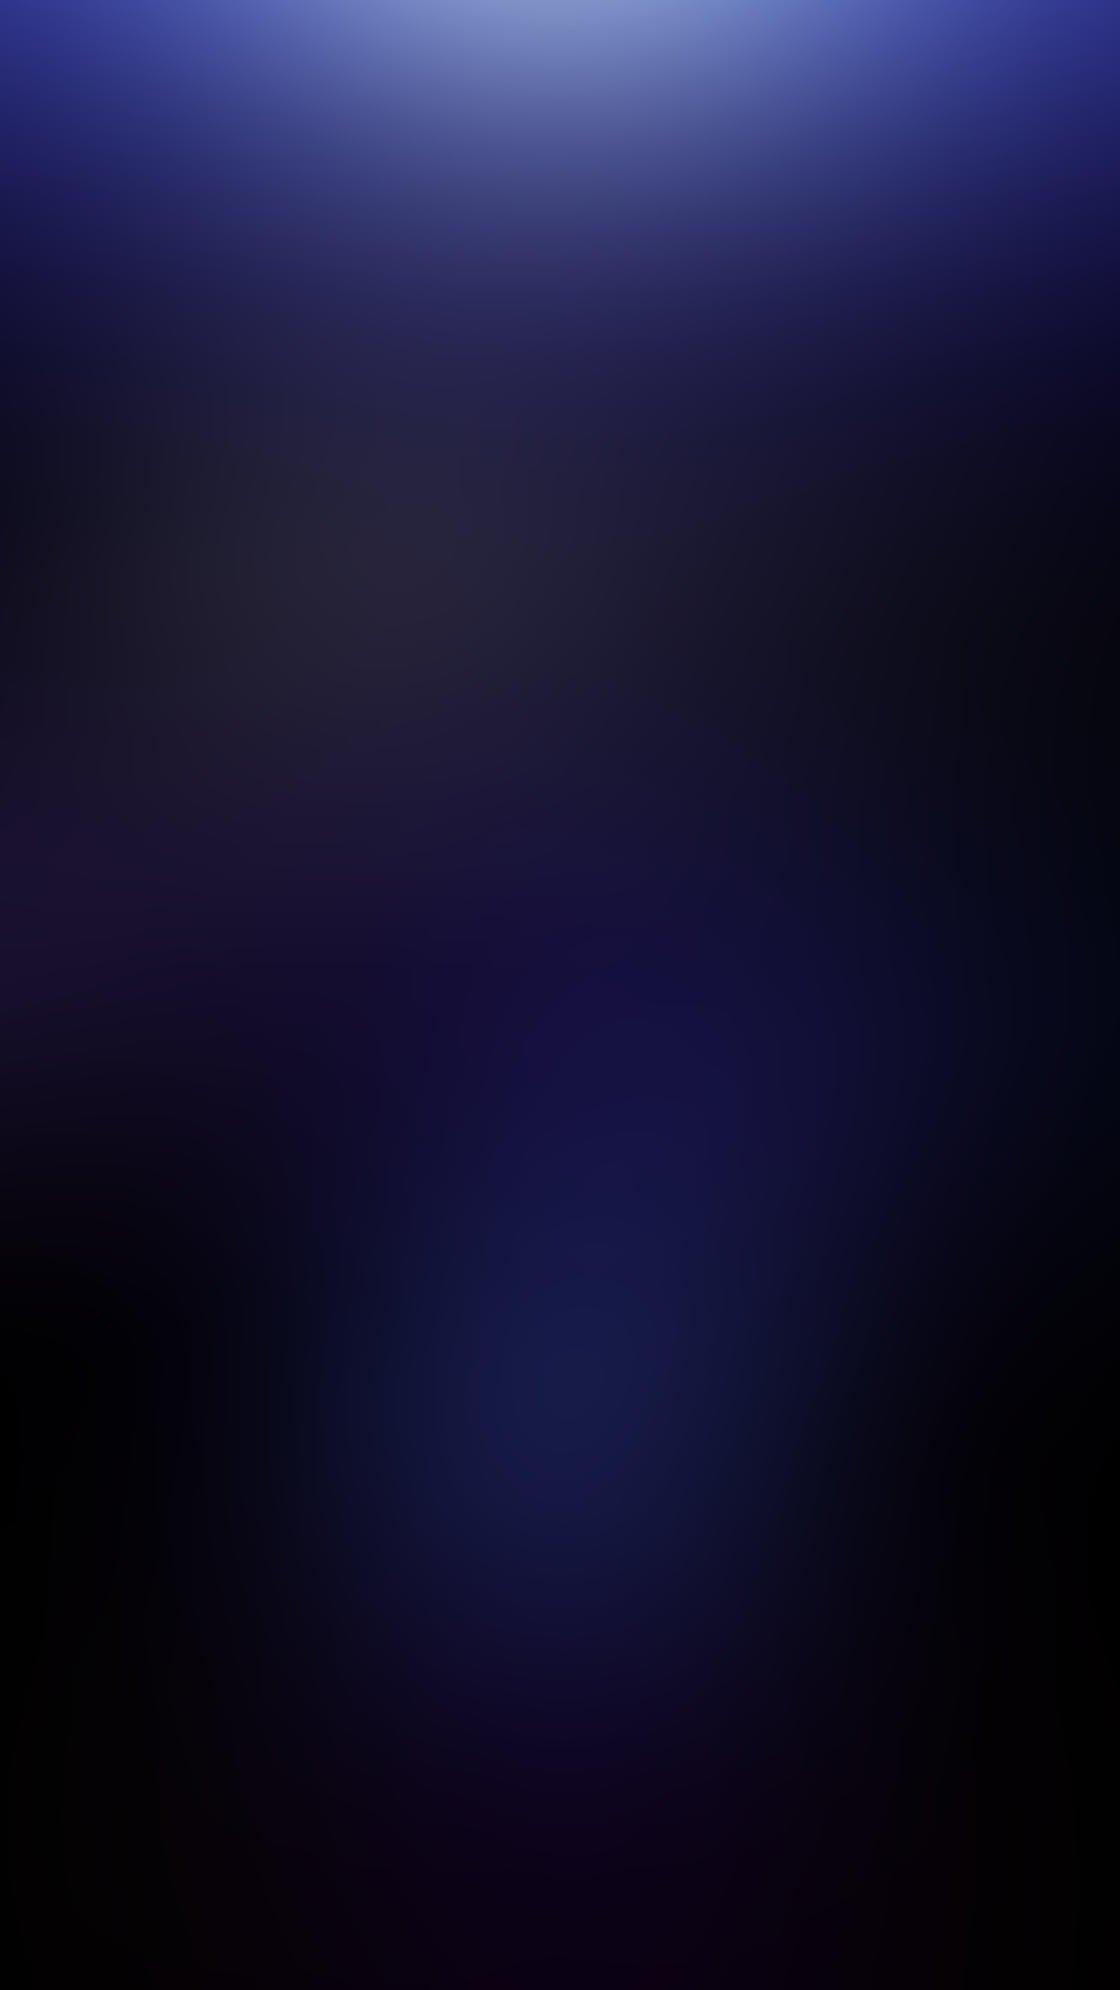 Lenslight iPhone Photo App 18